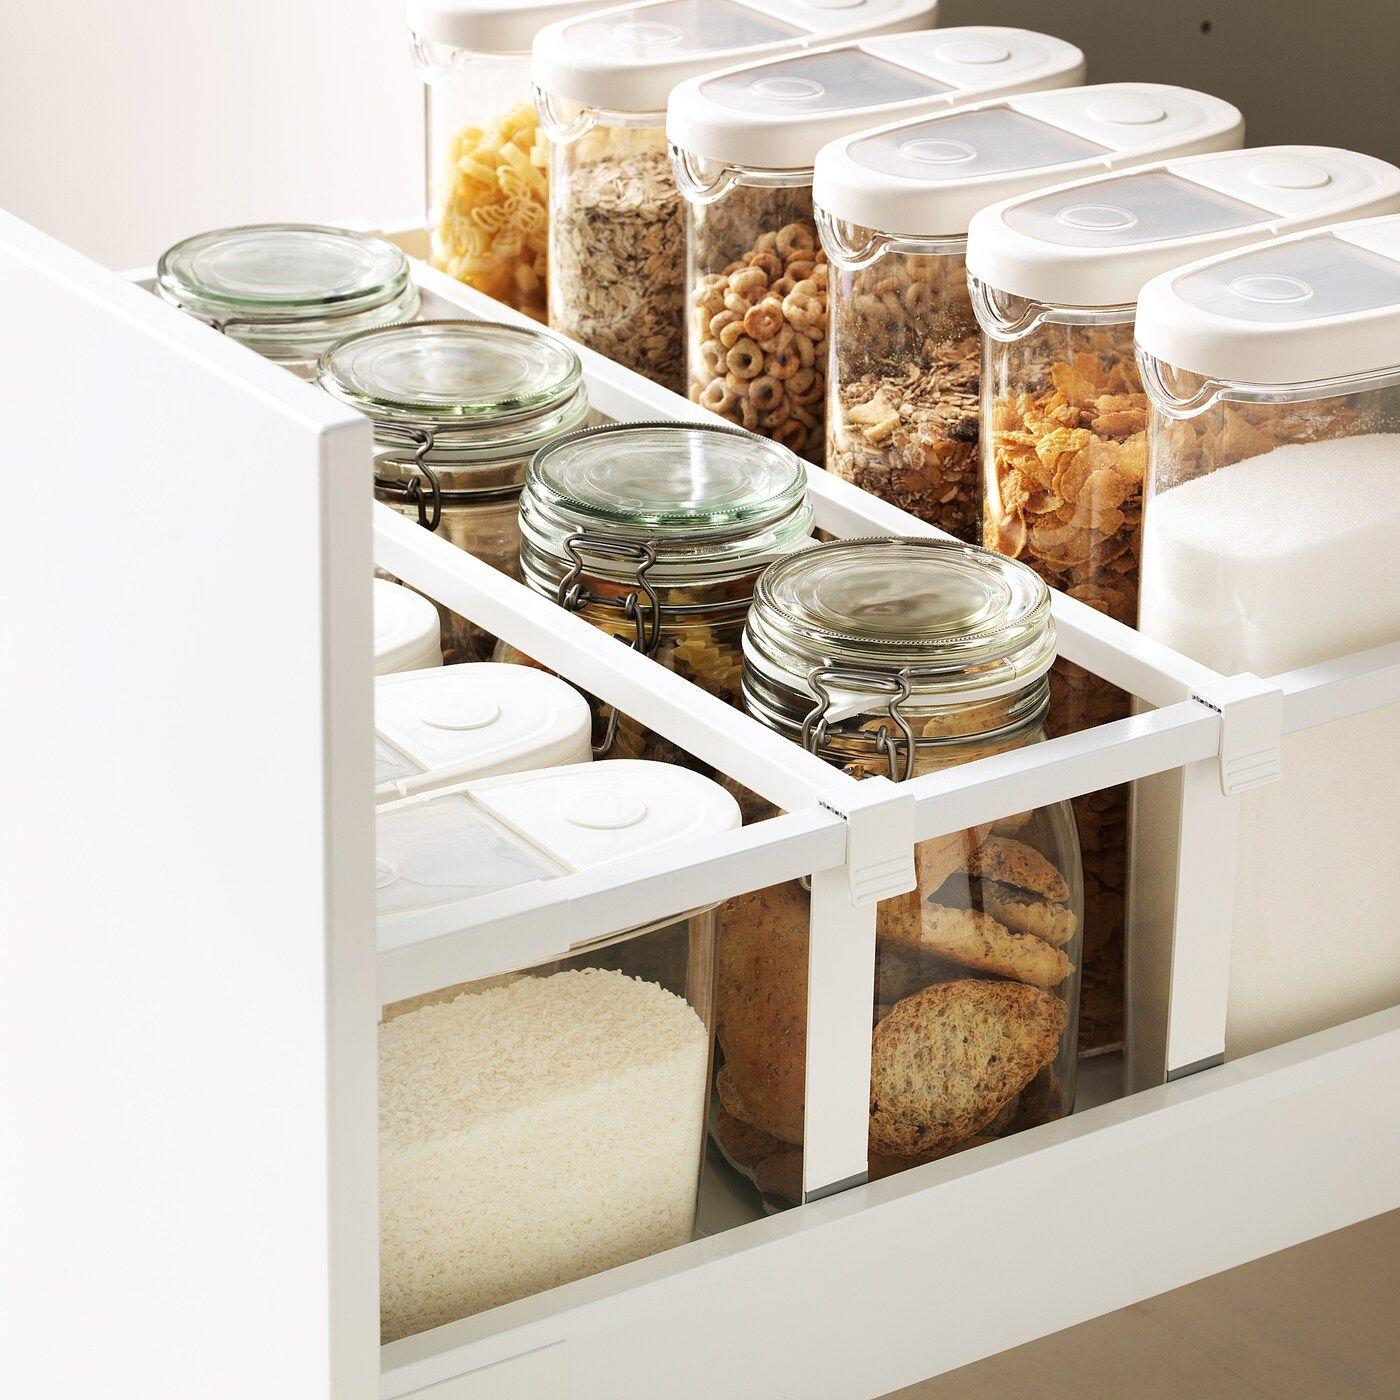 IKEA METOD / MAXIMERA Unterschrank 2 Fr/2 ni+1 haho+1 hohe Schublade/n - weiß/Bodbyn elfenbeinweiß